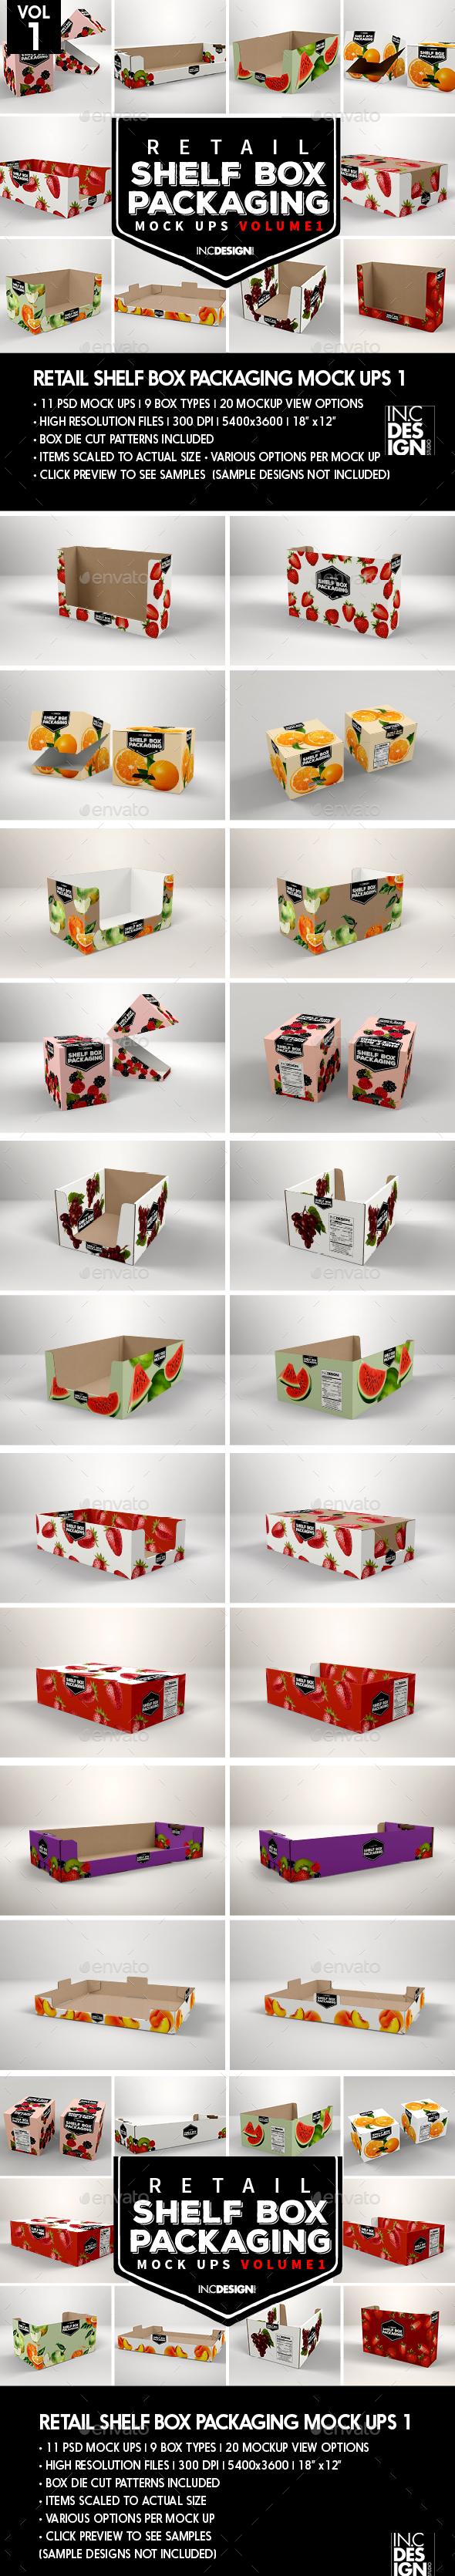 Retail Shelf Box Packaging MockUps - Food and Drink Packaging